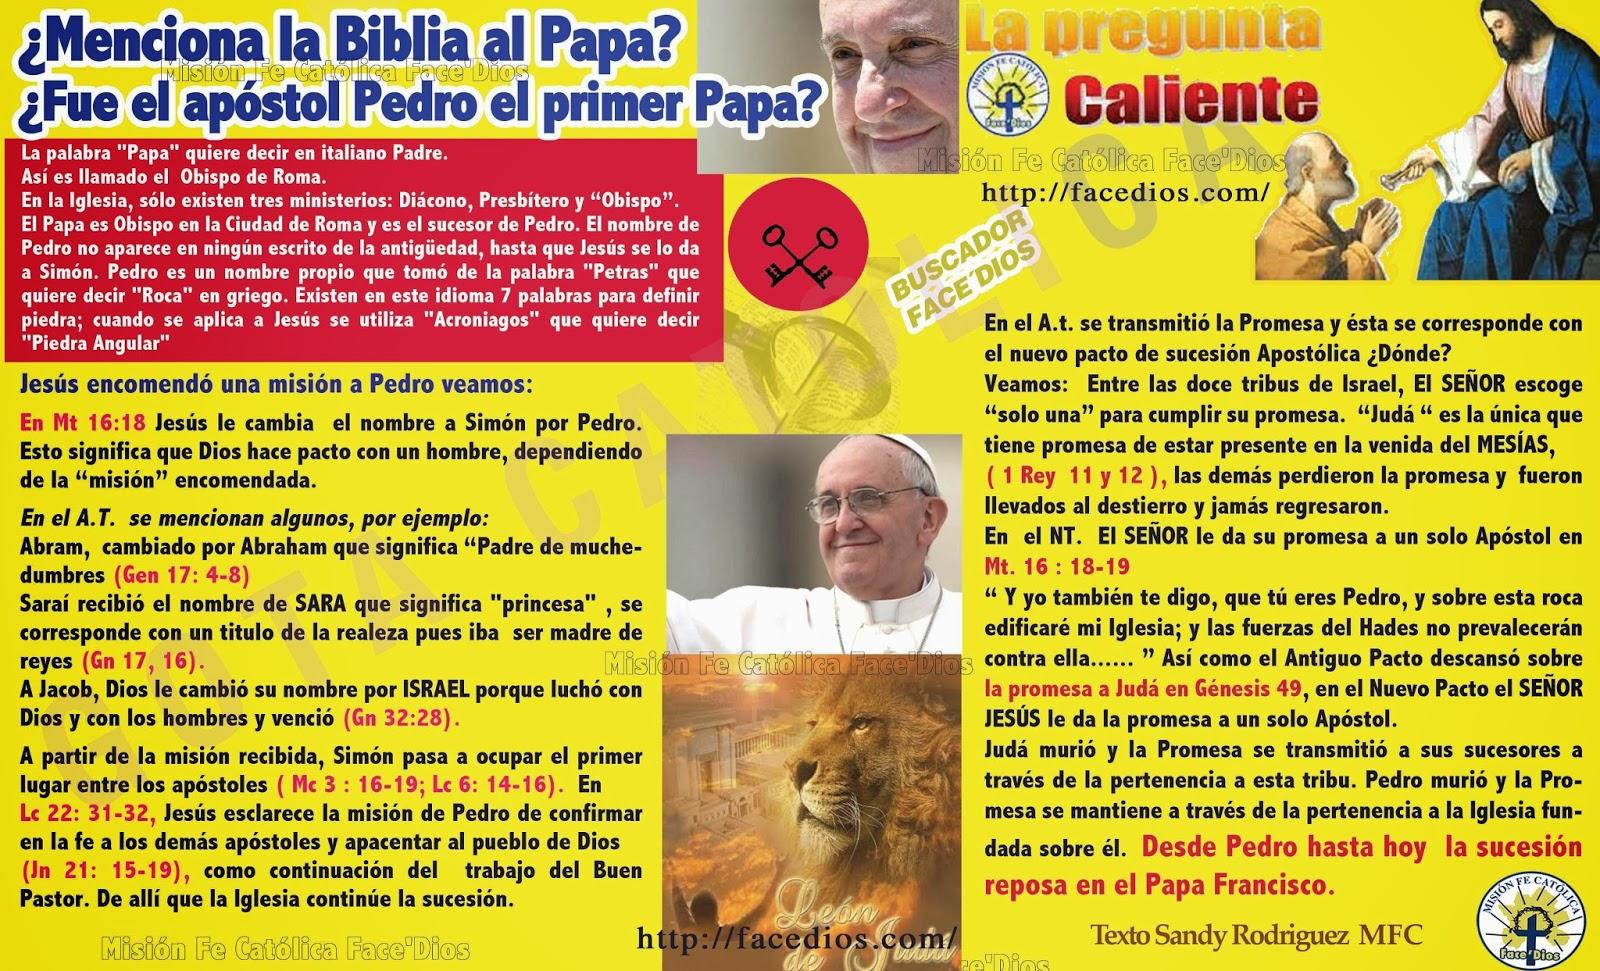 Gota Católica Gotas De Dios Menciona La Biblia Al Papa